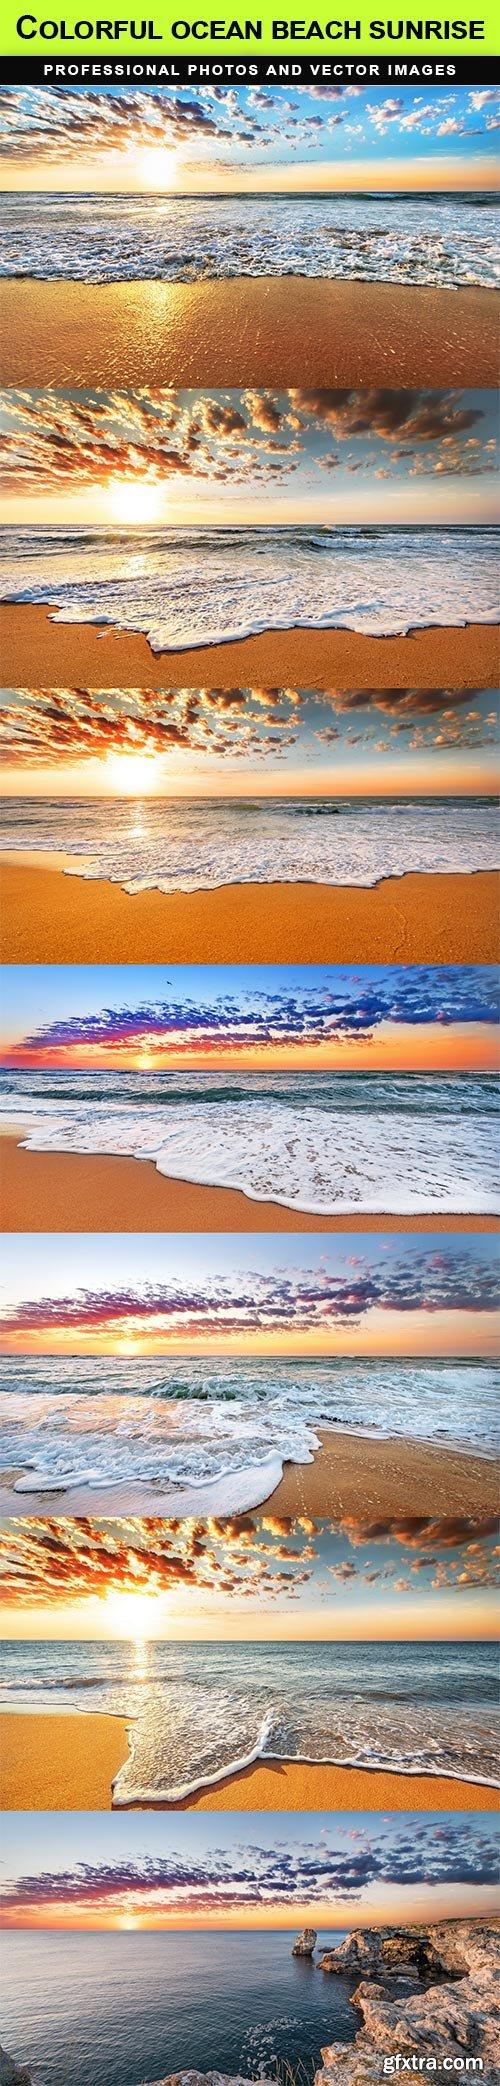 Colorful ocean beach sunrise